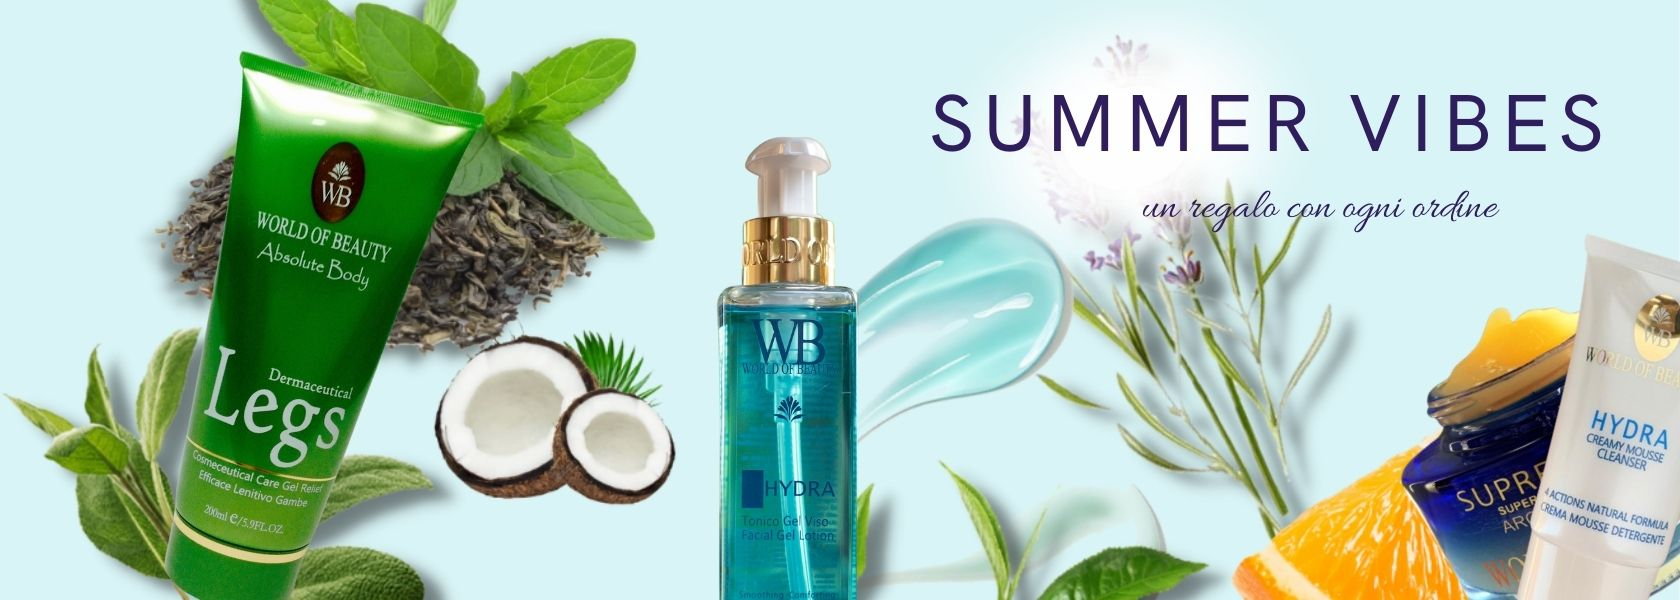 Summer Beauty promotion